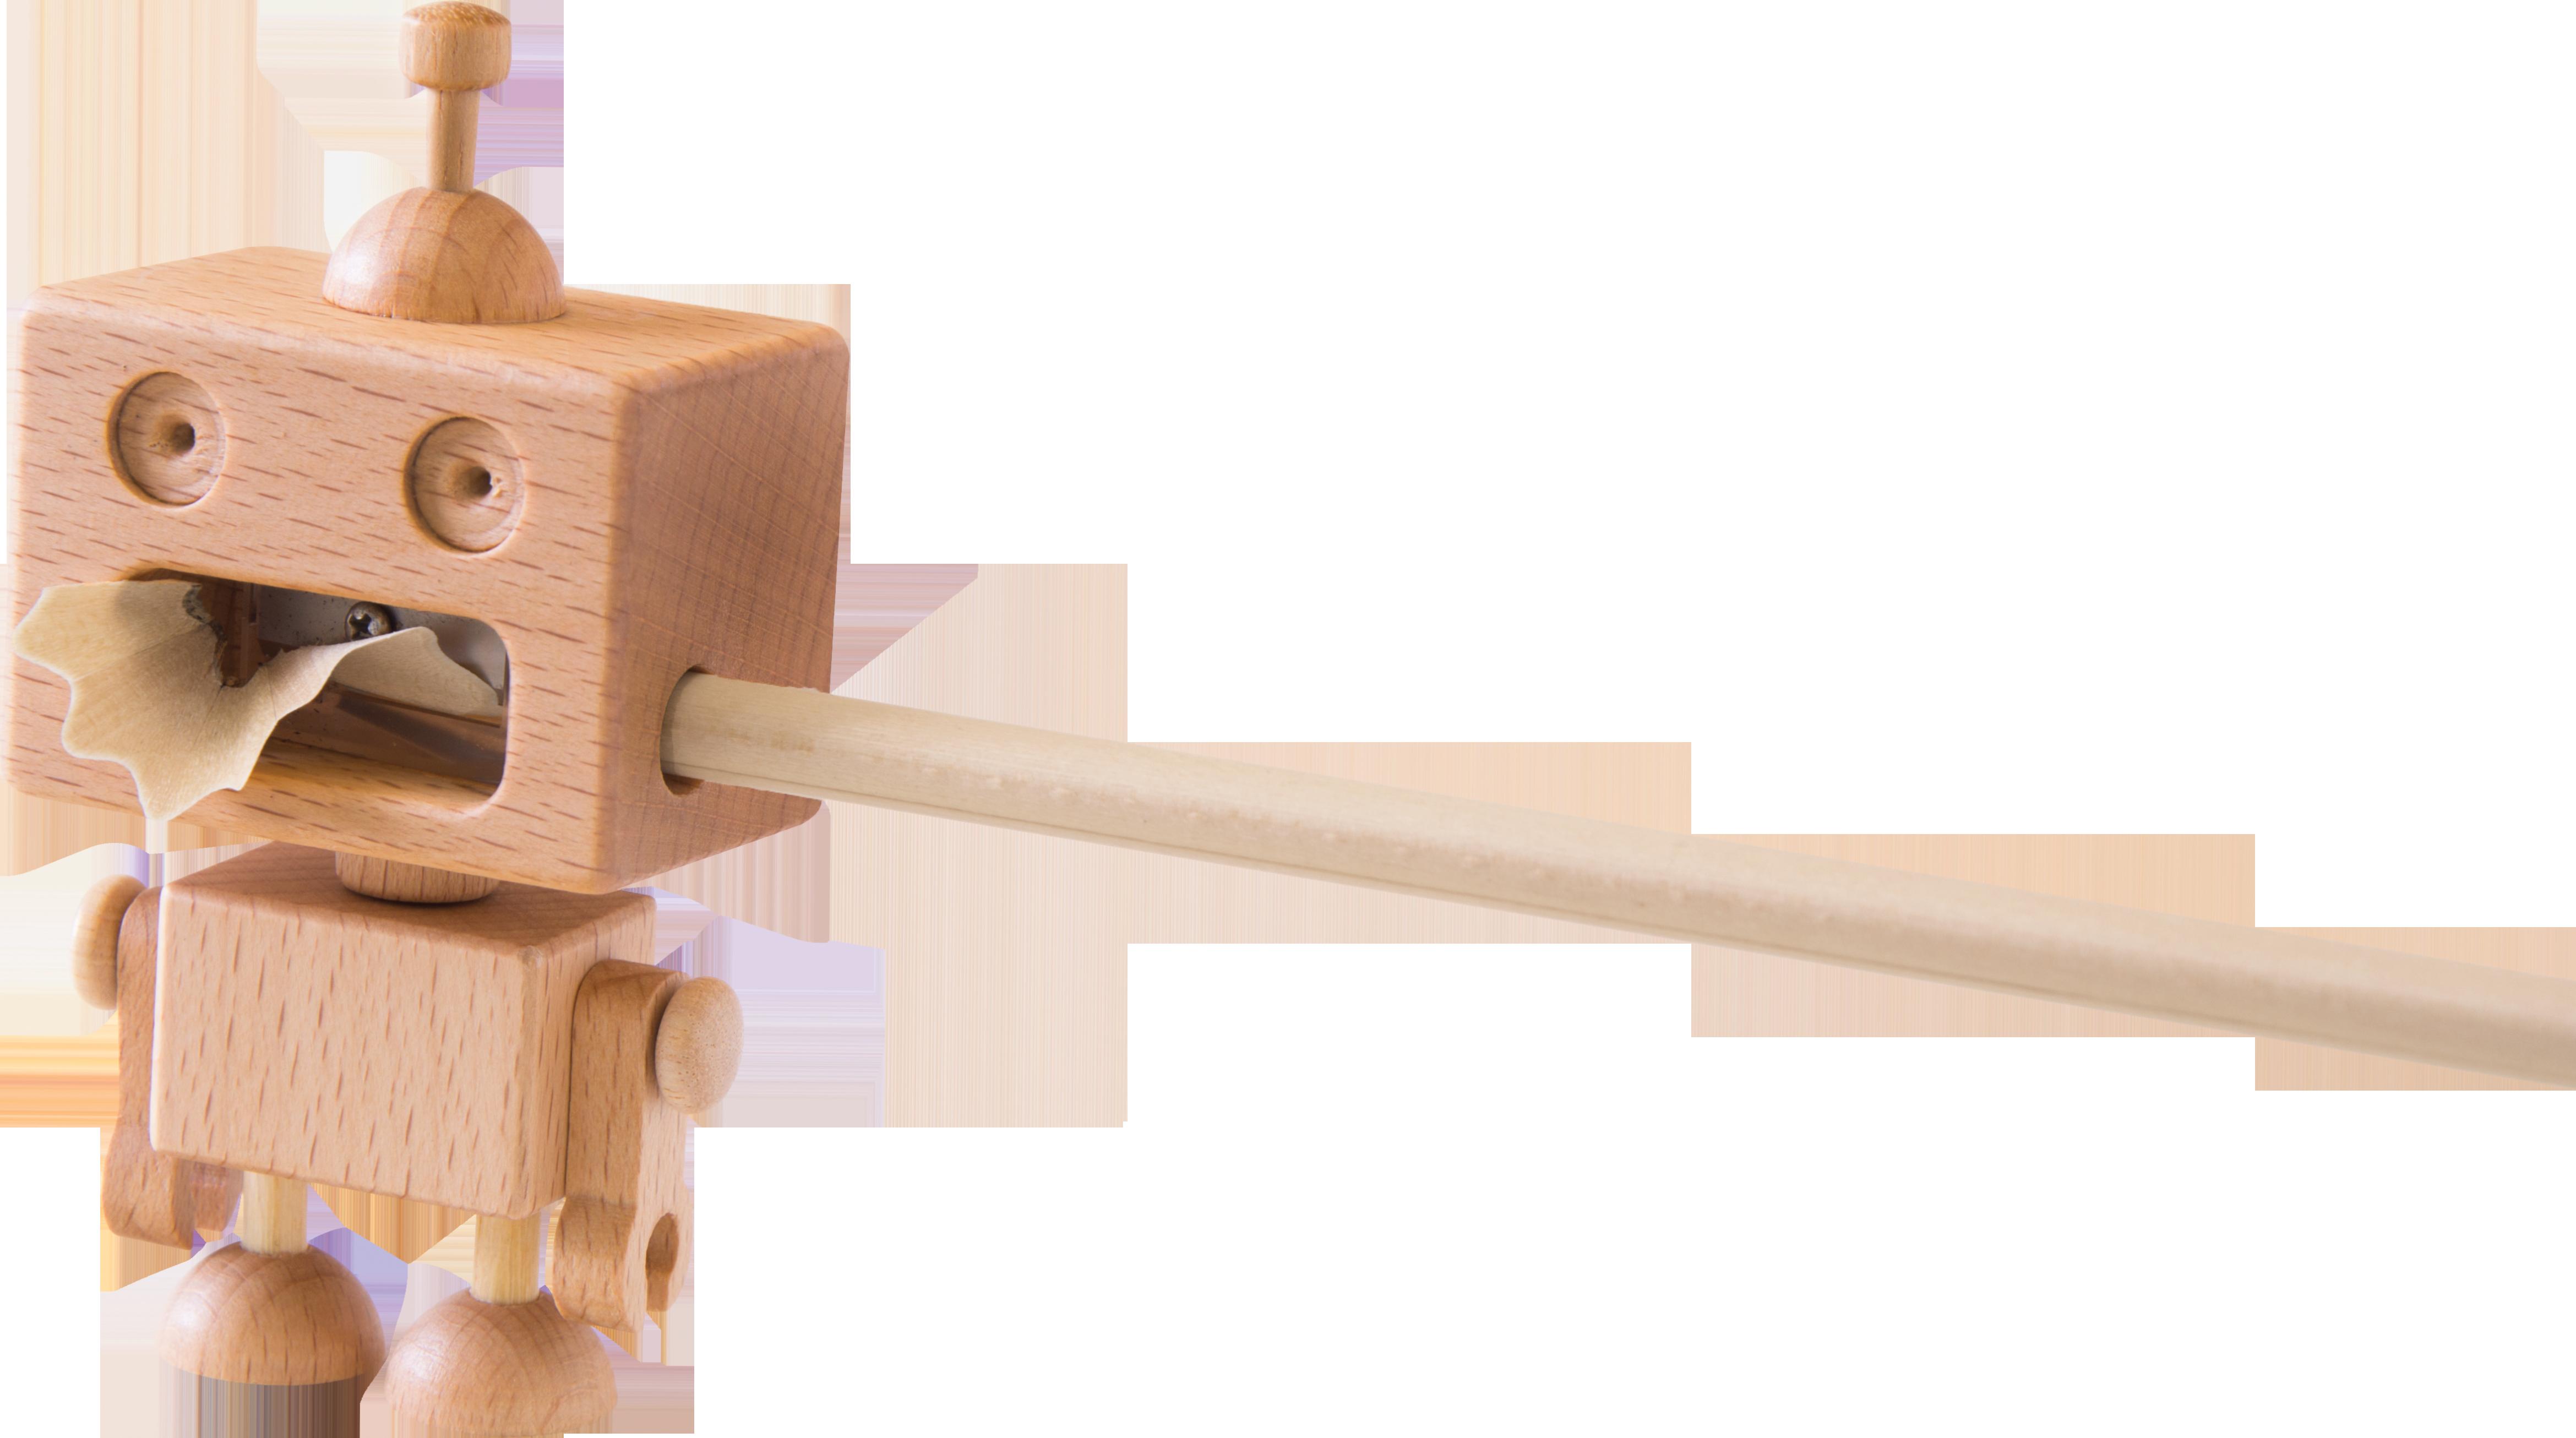 Wooden Robot Pencil Sharpener by Carpenter | Furniture & Home Décor ...